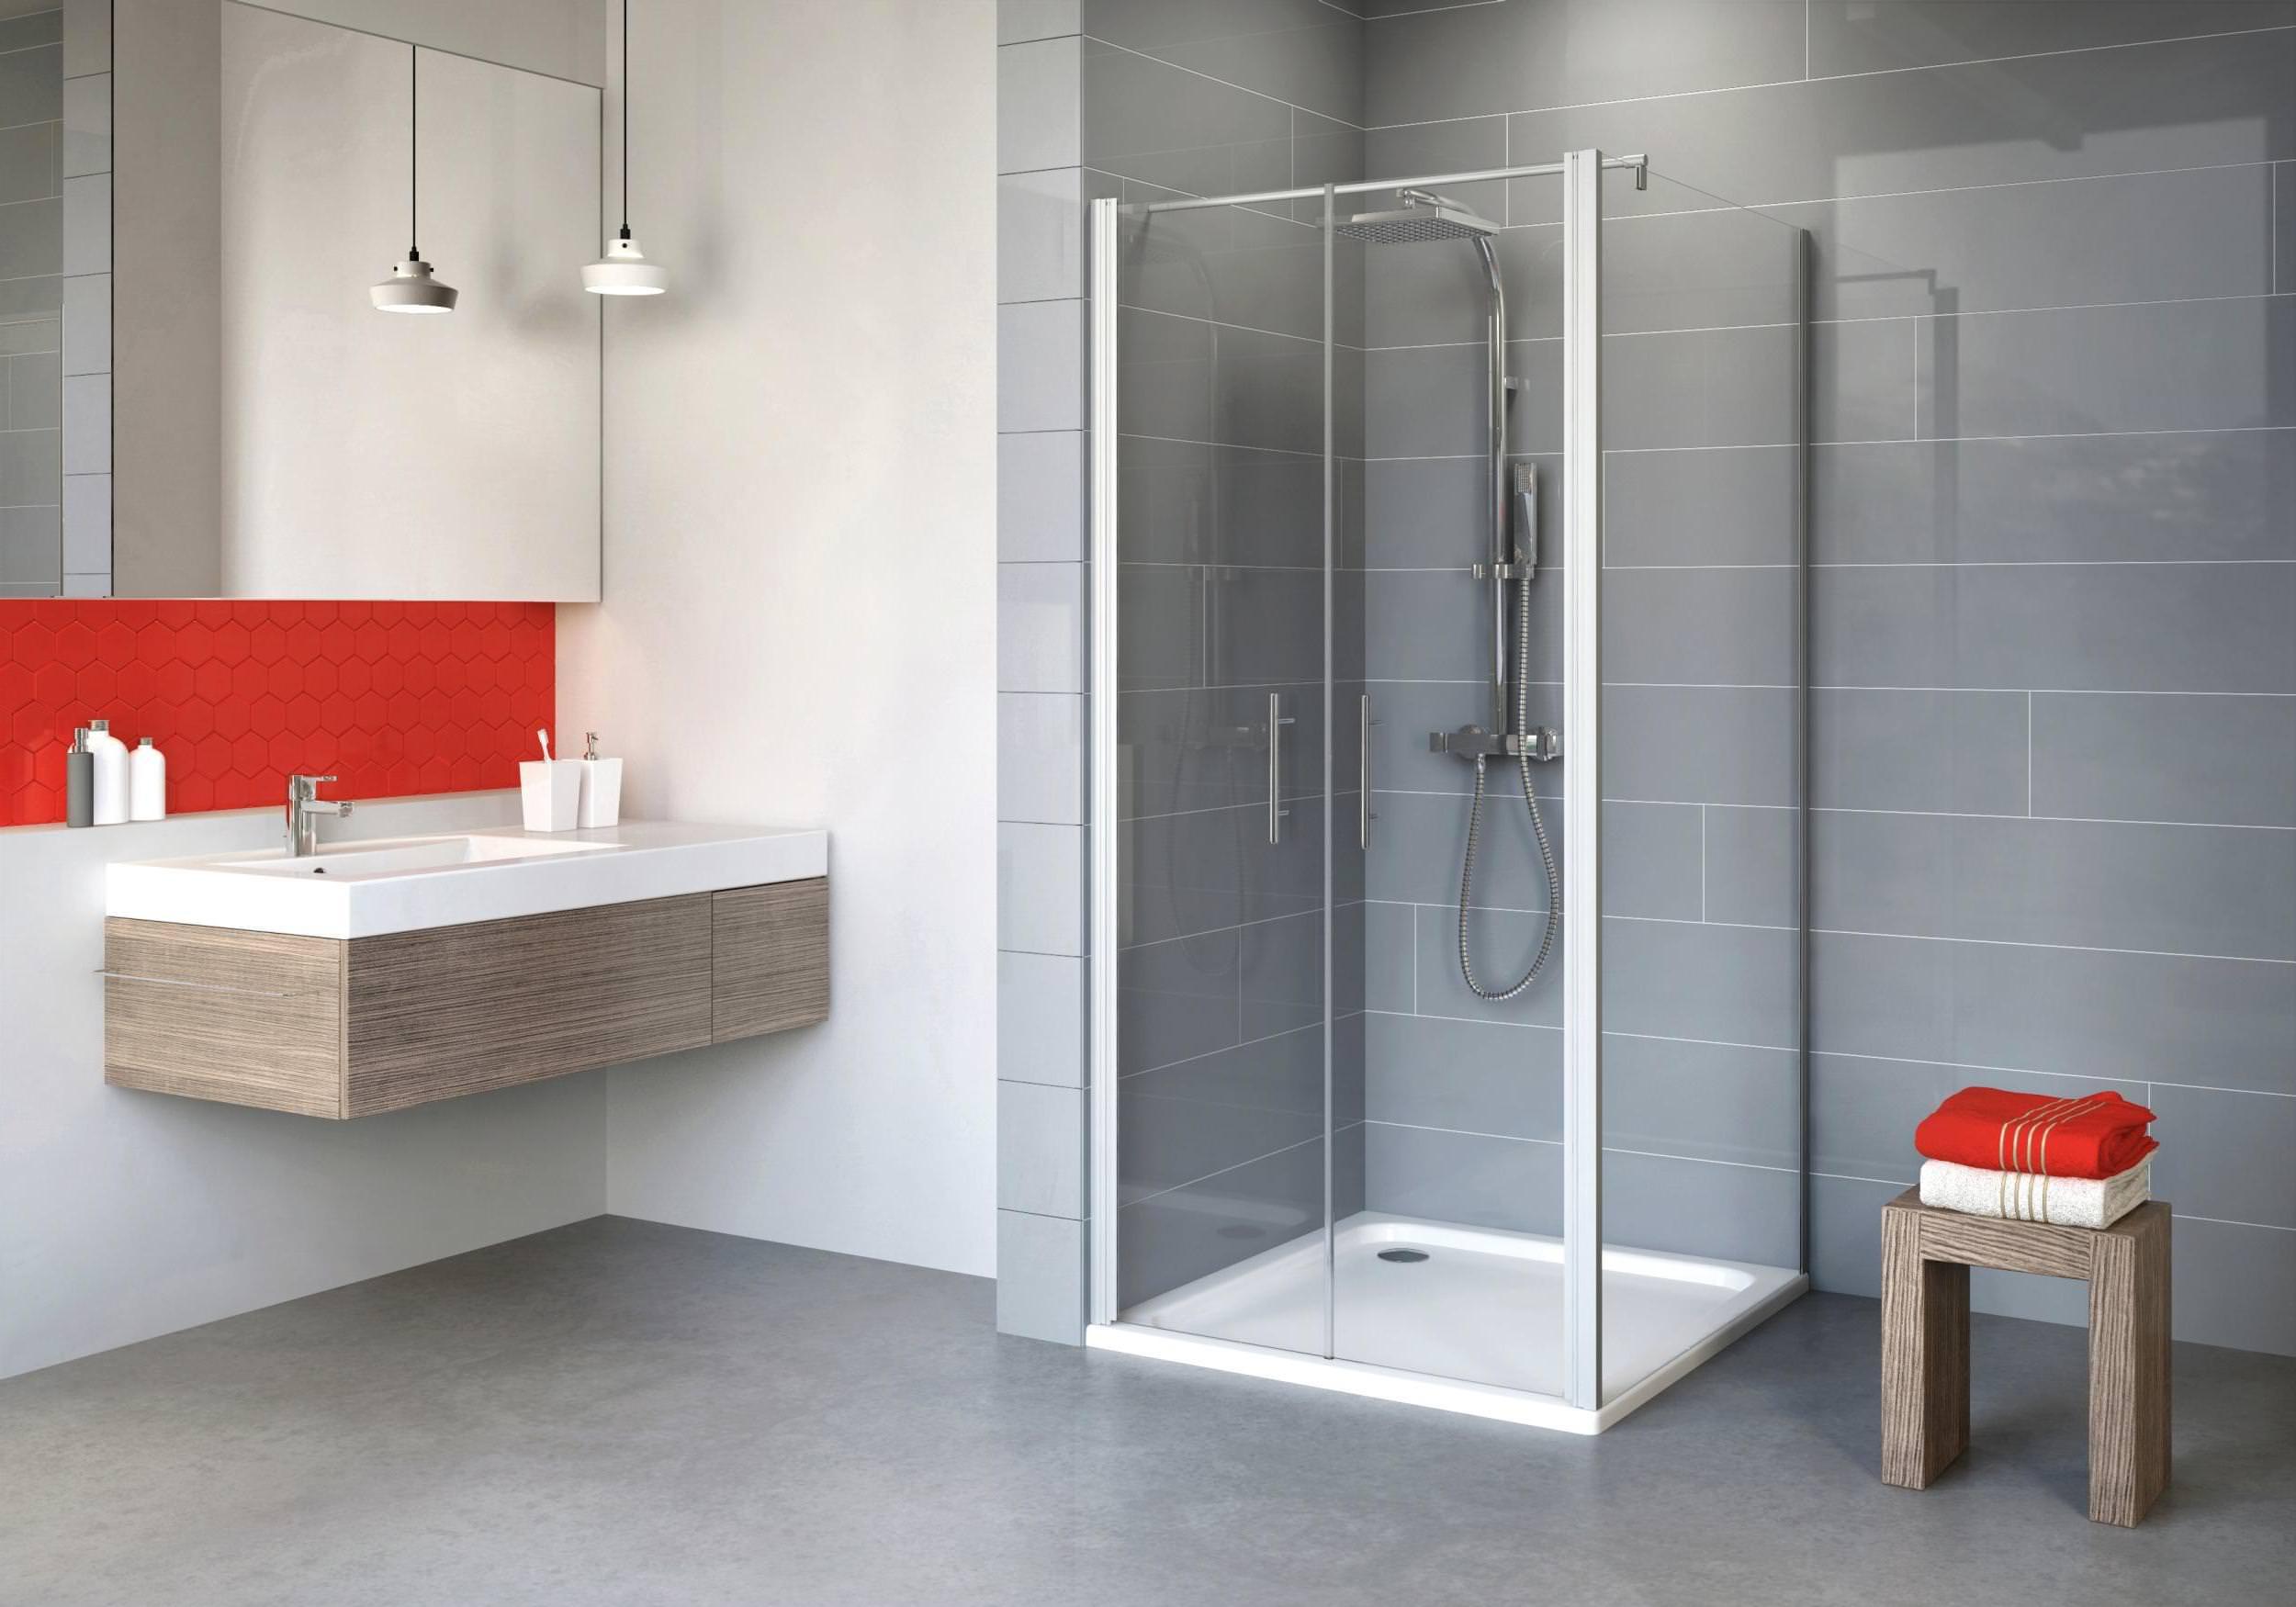 schulte alexa style 2 0 pendelt r 2 teilig mit seitenwand klarglas hell alunatur 80 x 80 cm. Black Bedroom Furniture Sets. Home Design Ideas